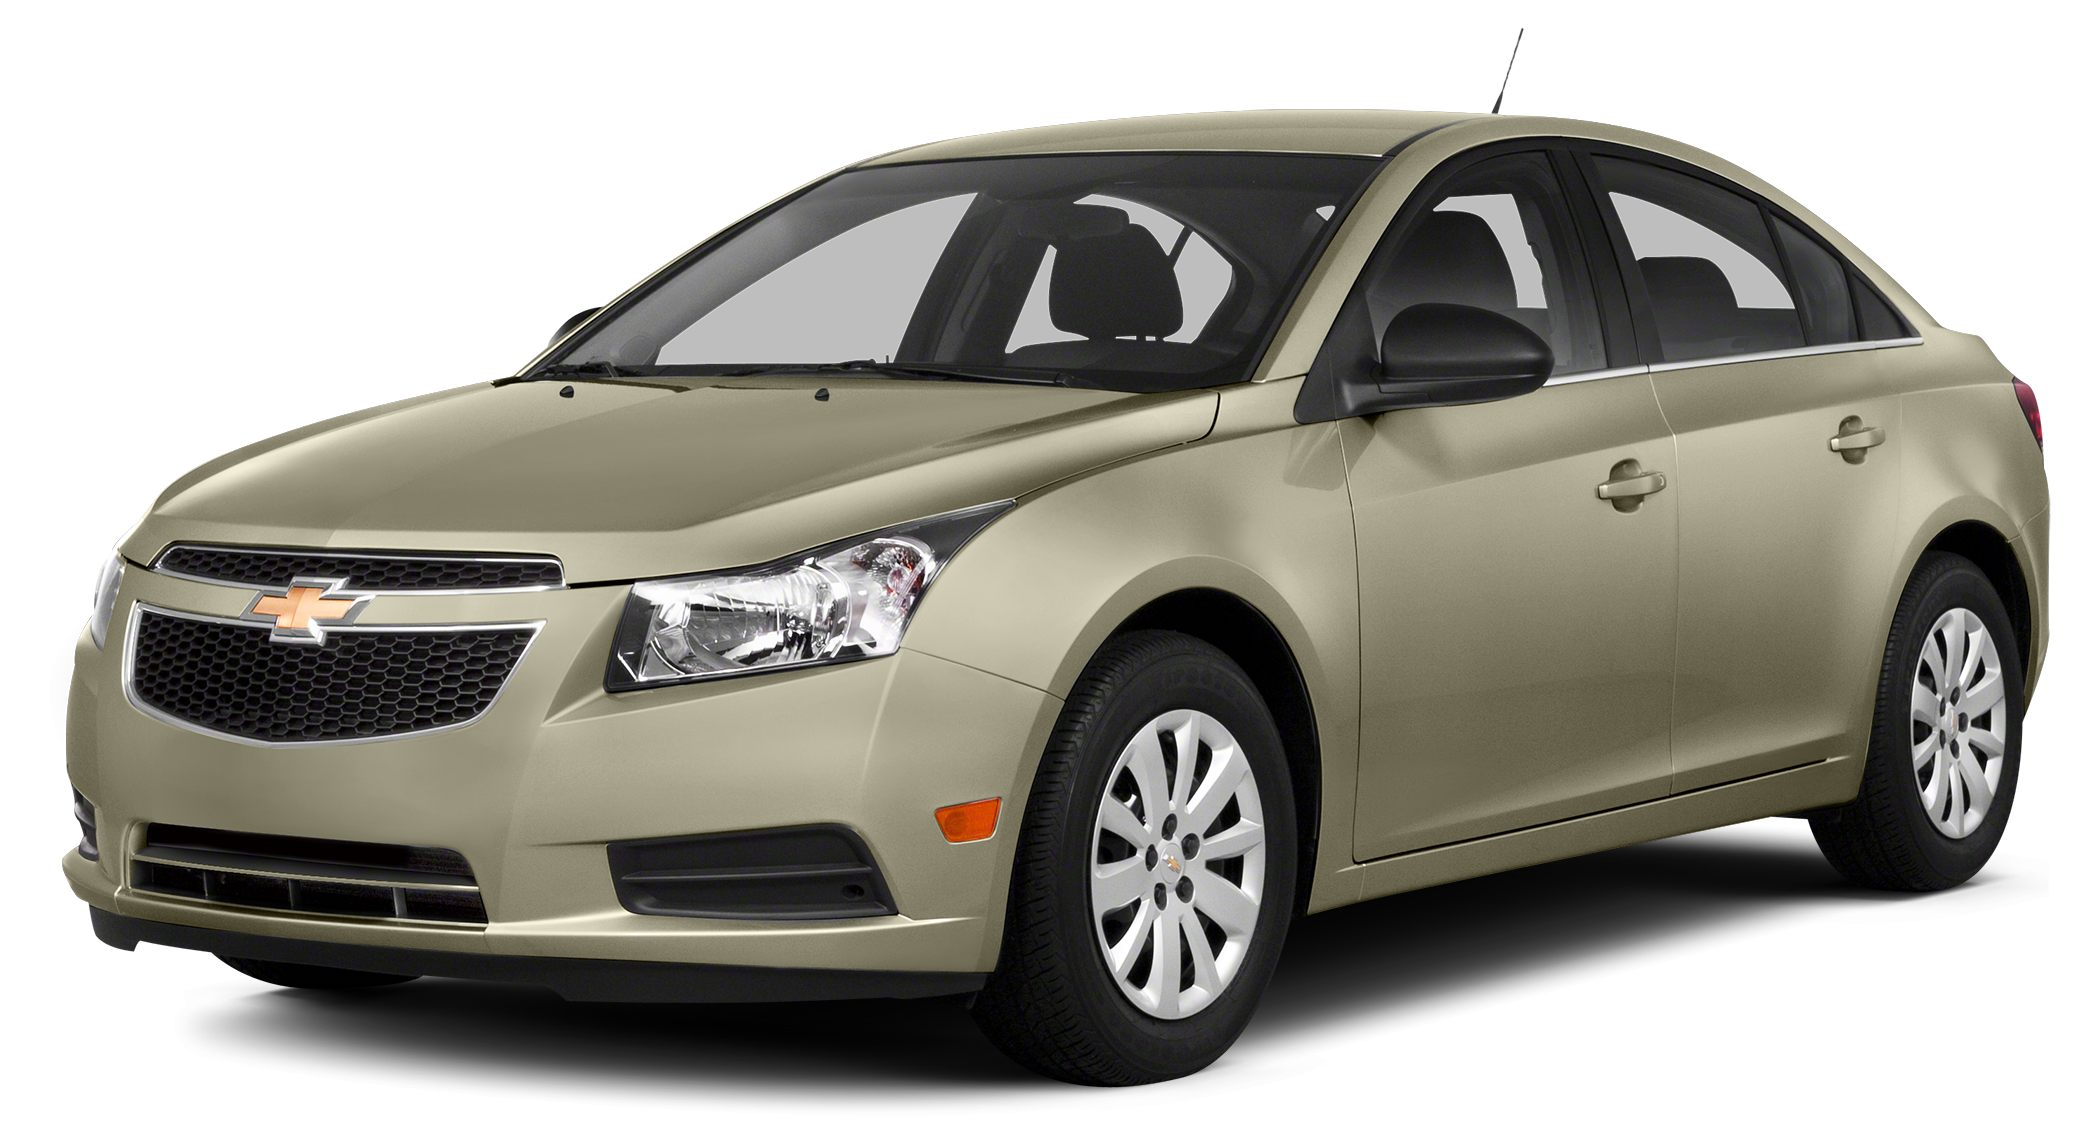 2014 Chevrolet Cruze 1LT Miles 38208Color Tan Stock 19708 VIN 1G1PC5SB9E7347111